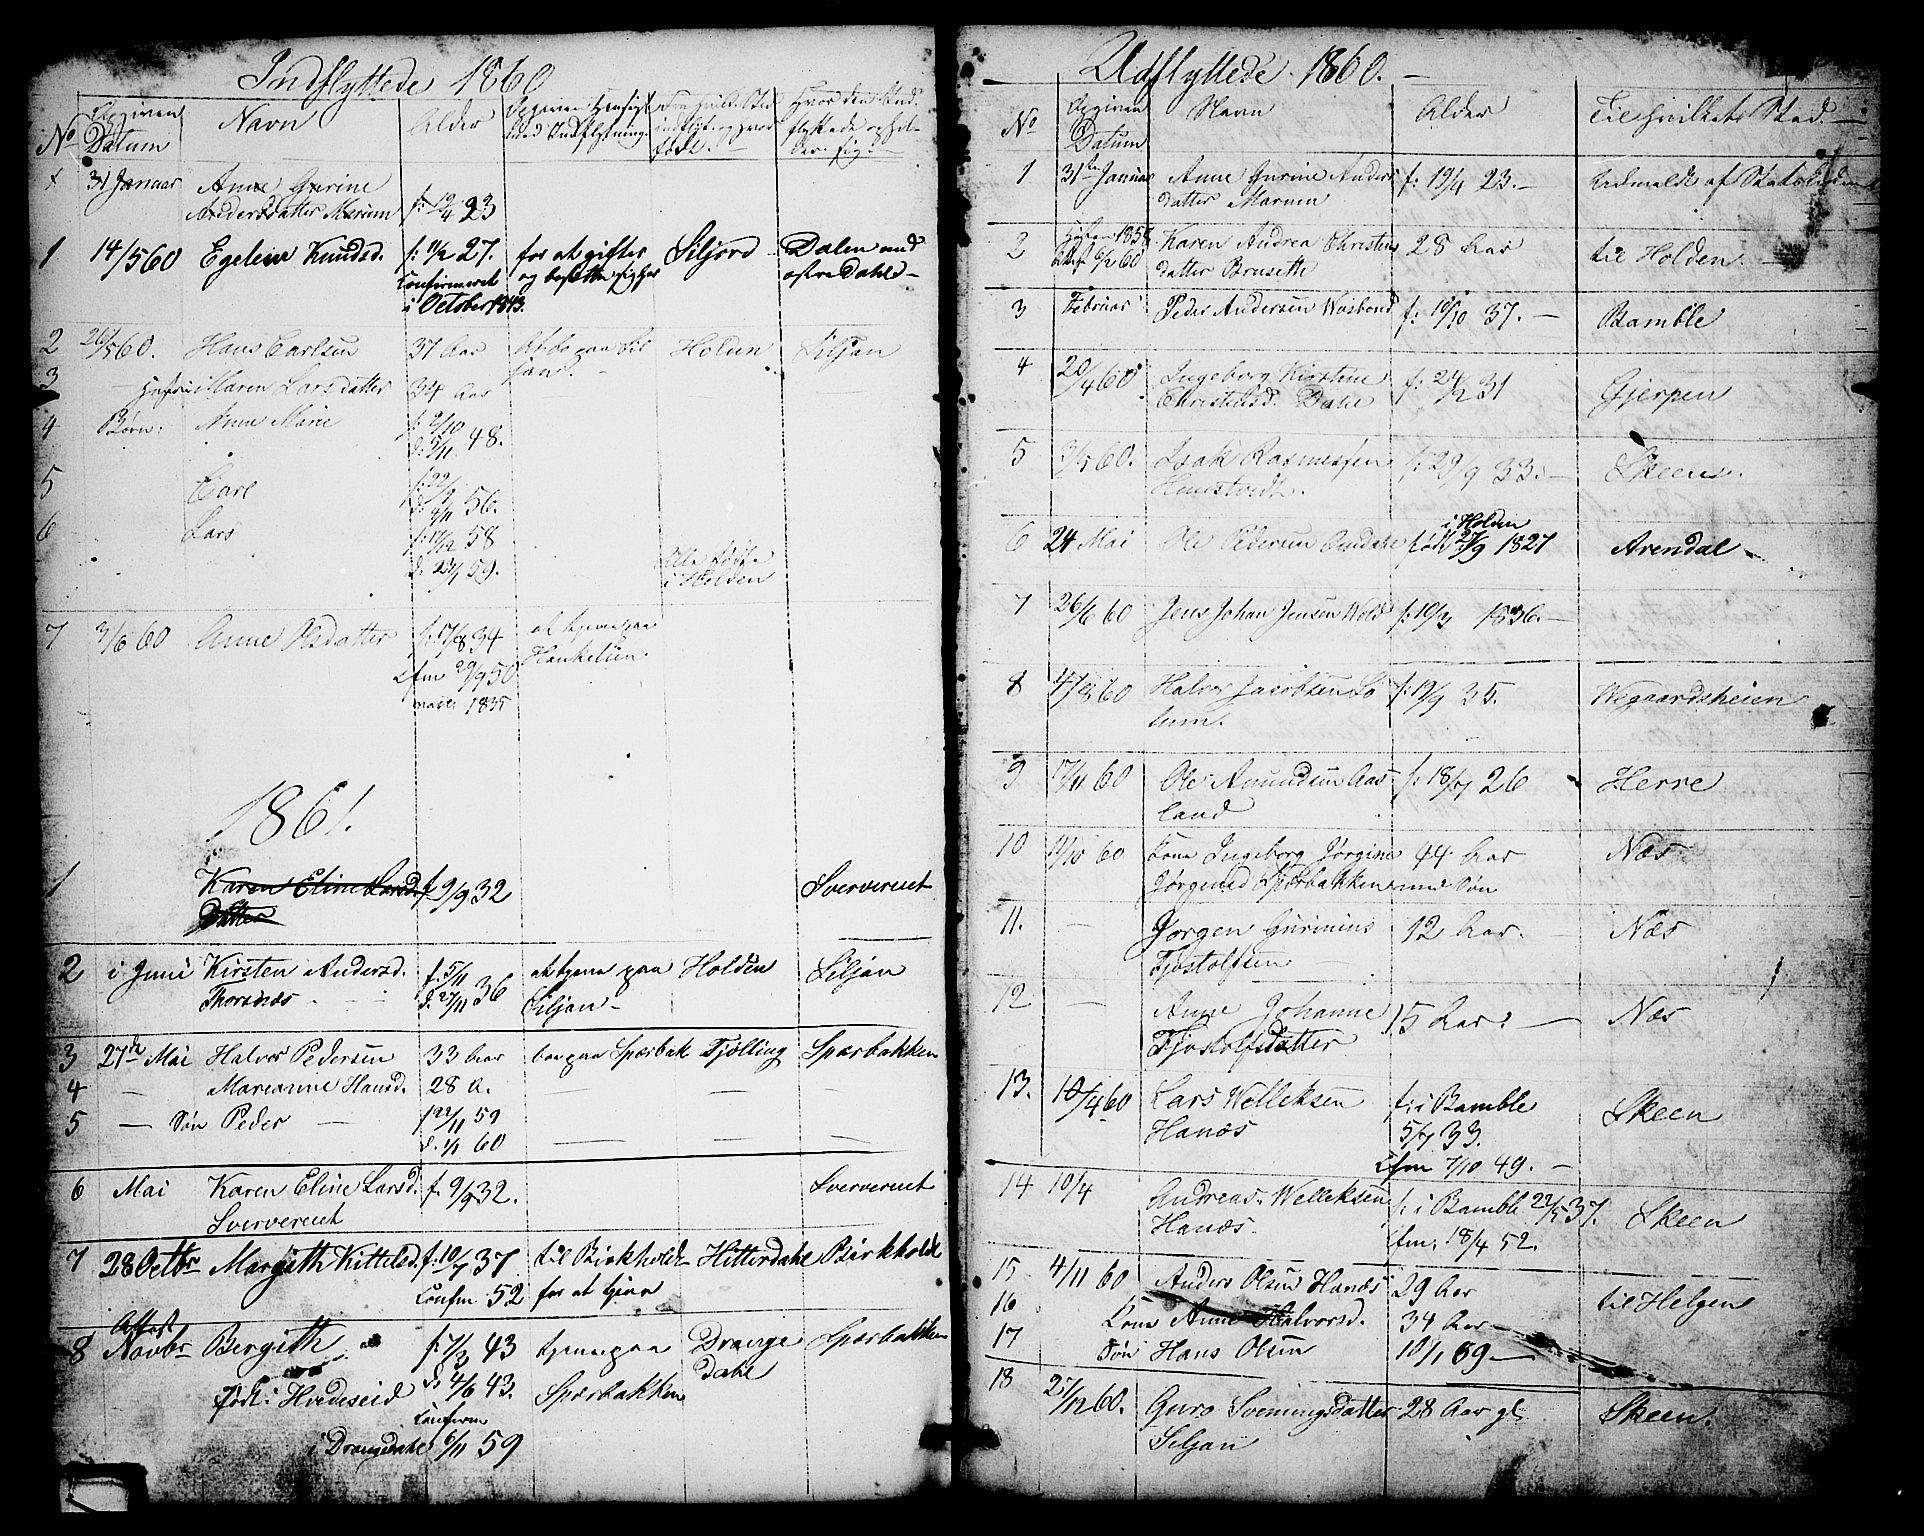 SAKO, Solum kirkebøker, G/Gb/L0002: Klokkerbok nr. II 2, 1859-1879, s. 181